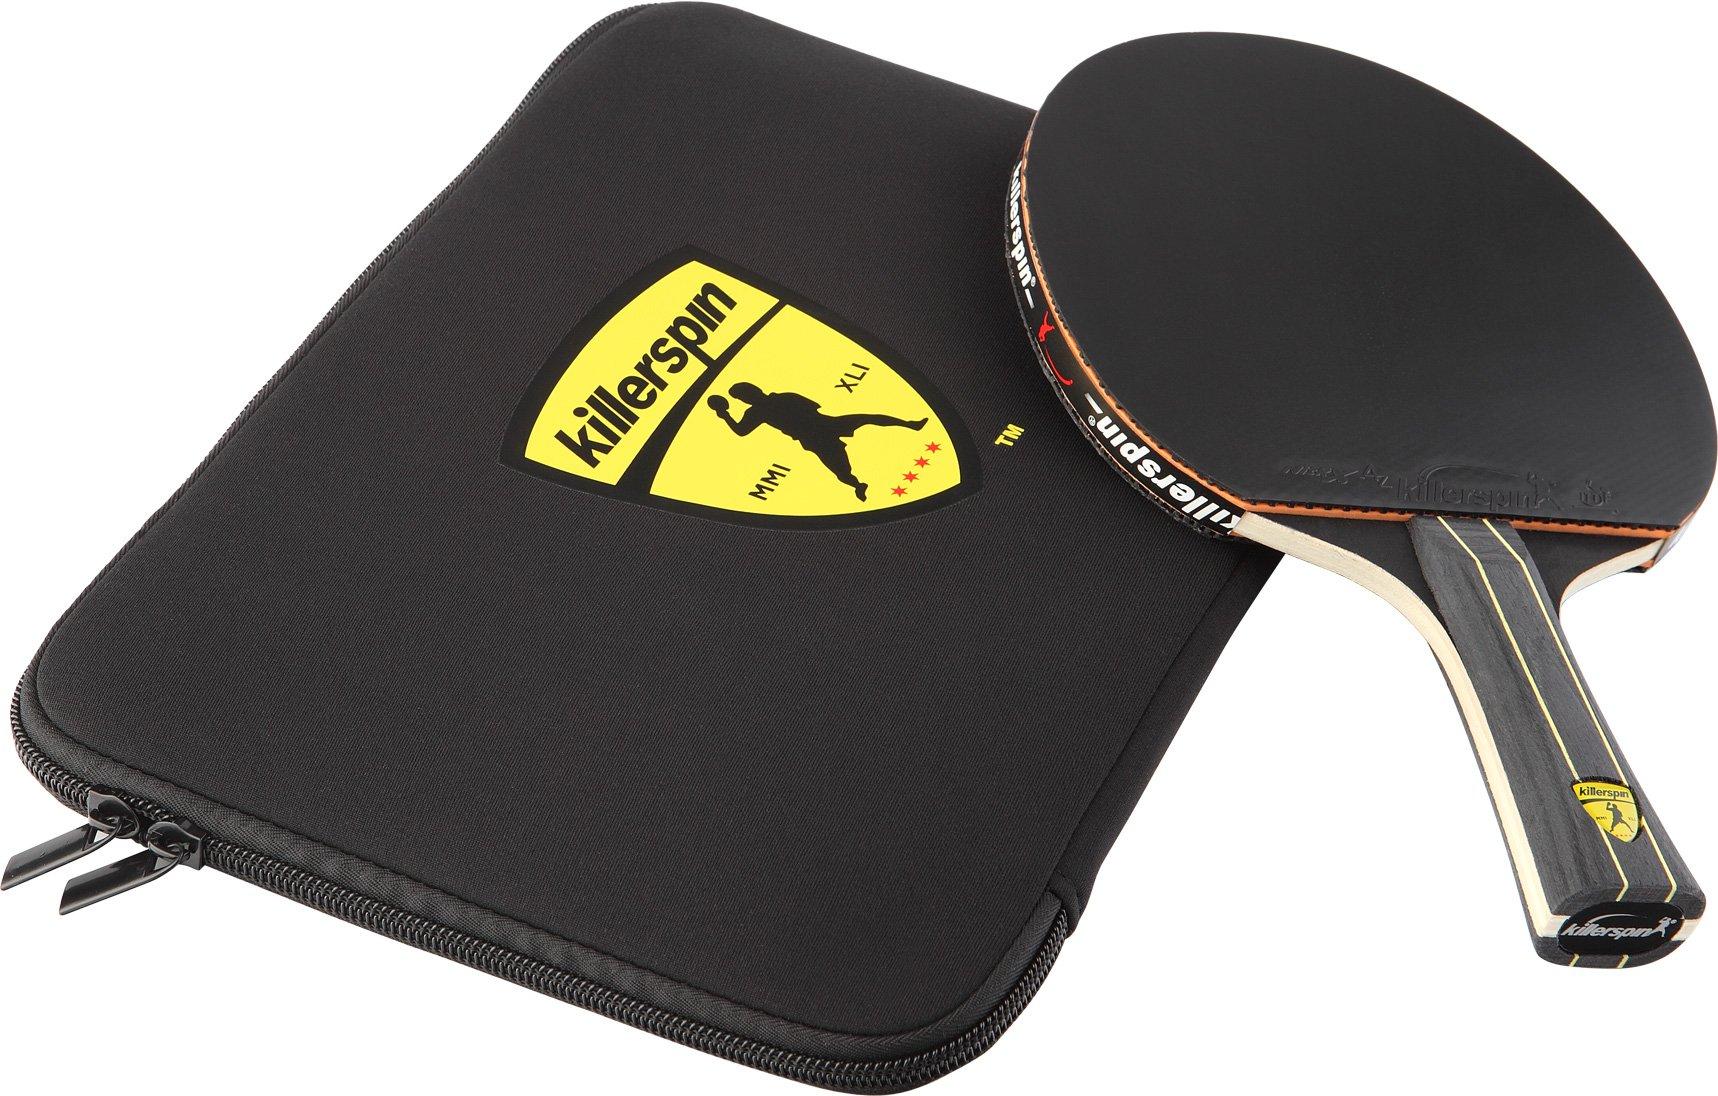 edfd6670d72 Killerspin Jet Black Ping Pong Racket Combo – Intermediate Table ...